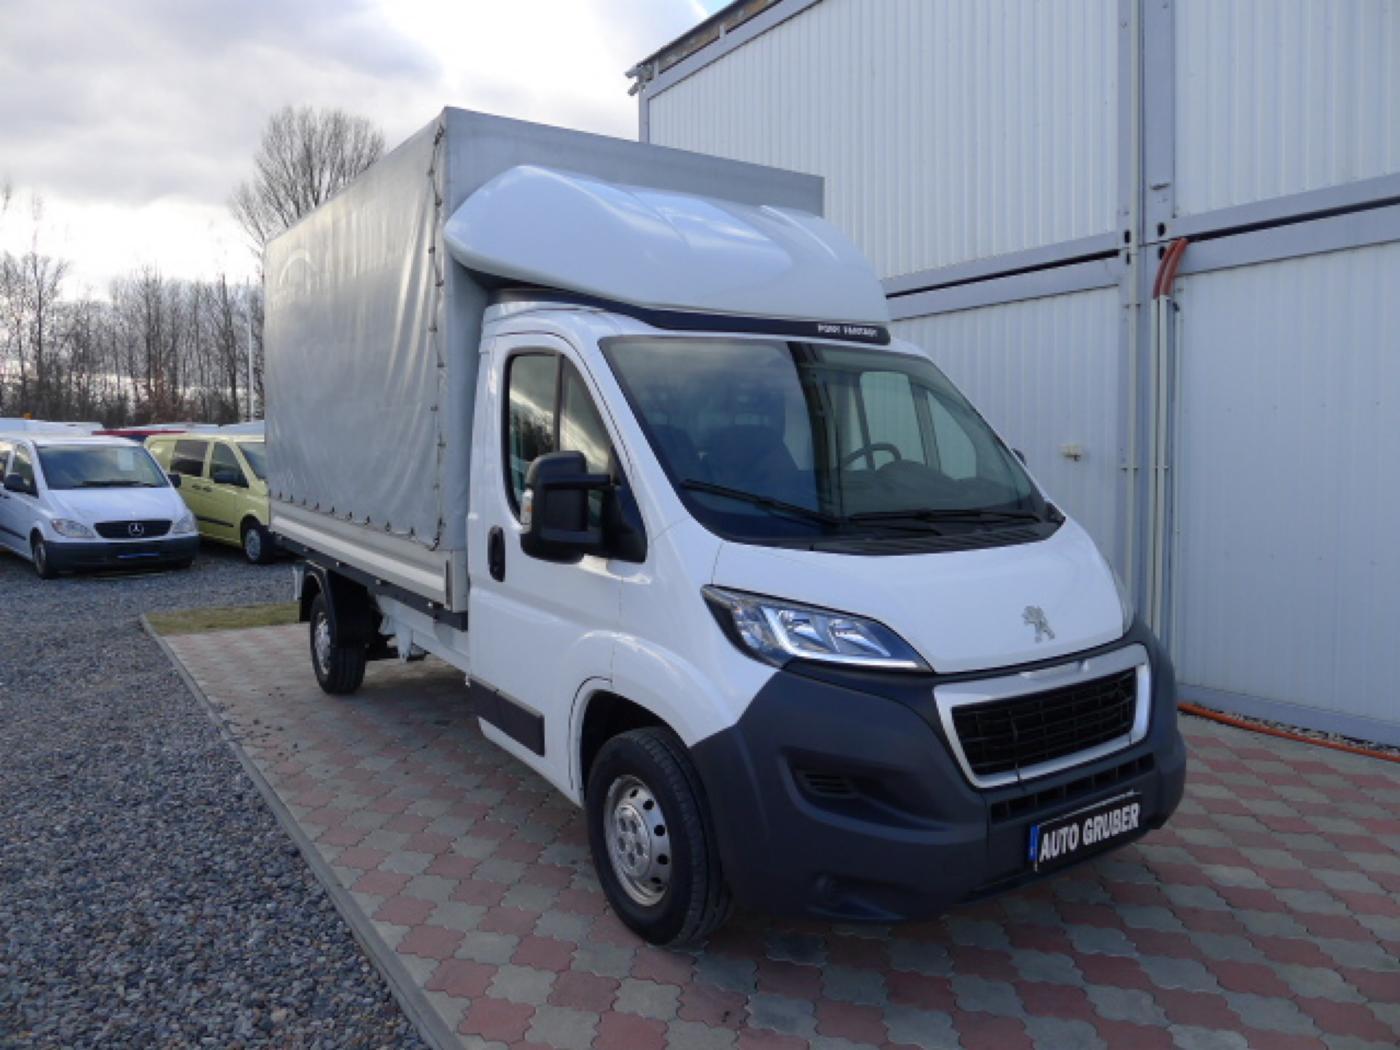 Peugeot Boxer 2,2 HDI Valnik+Plachta+Klima+Mìchy - 1